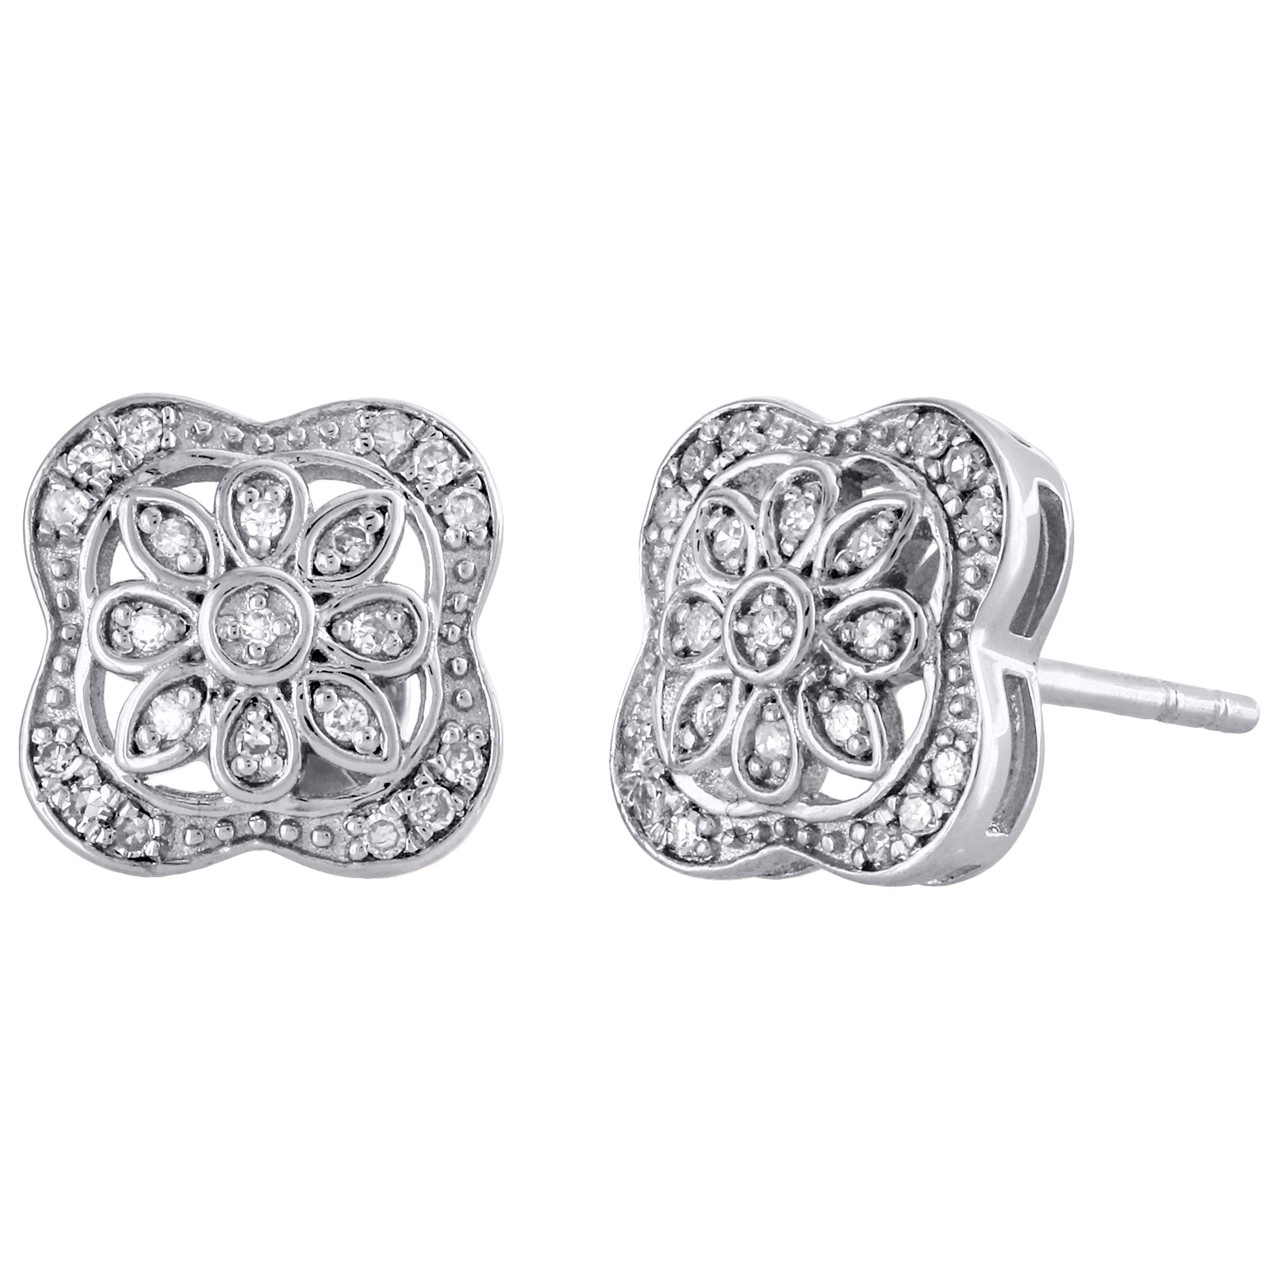 Square Stud Earrings .925 Sterling Silver